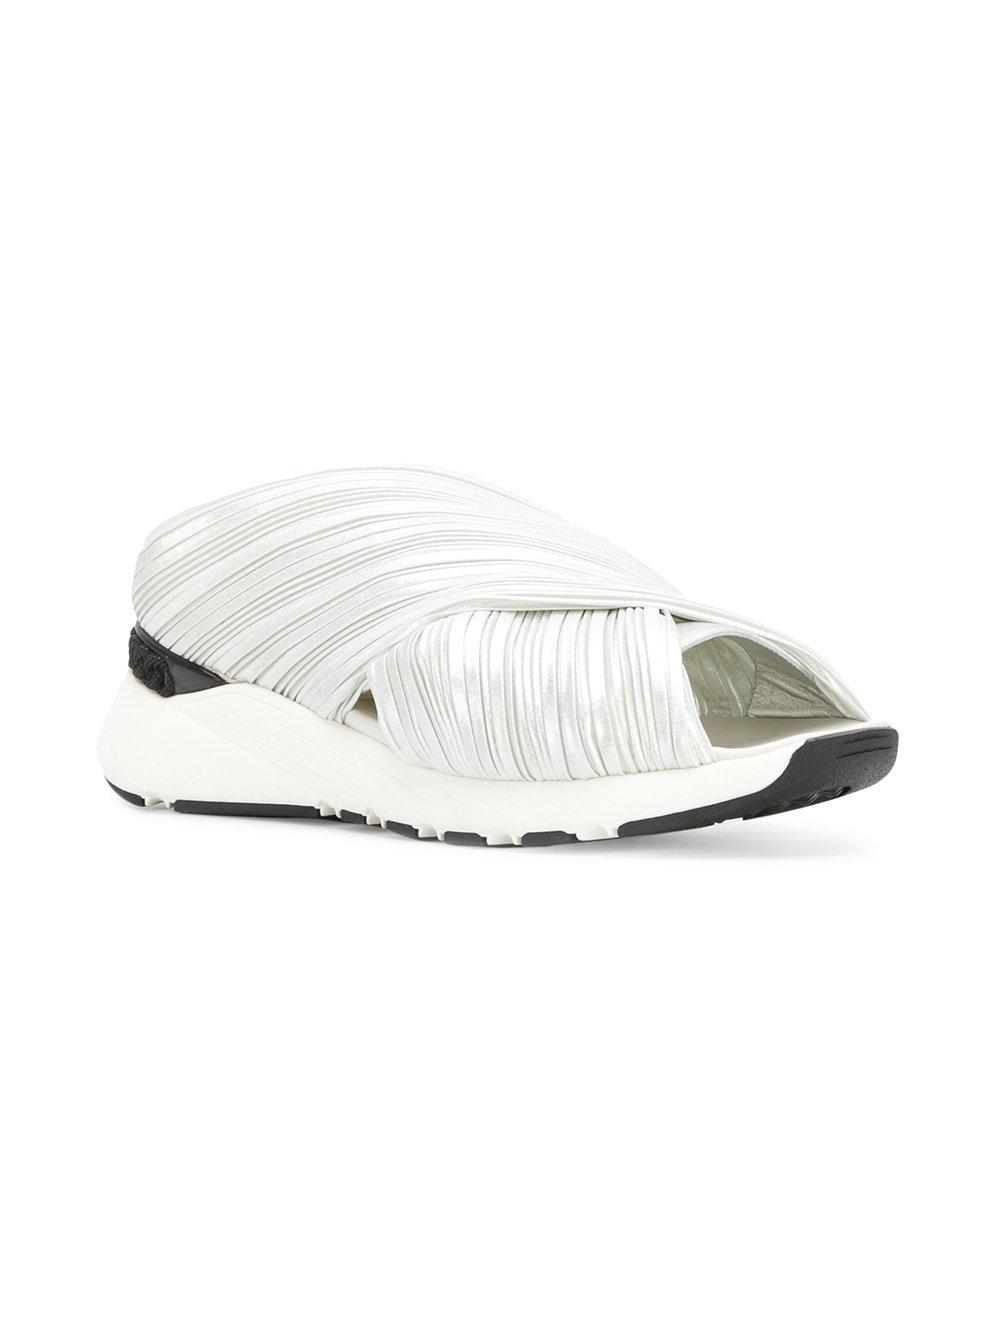 Cuir Logo Imprimé Rue Urbaine Glisser Sur Chaussures De Sport - Blanc Givenchy Dggir